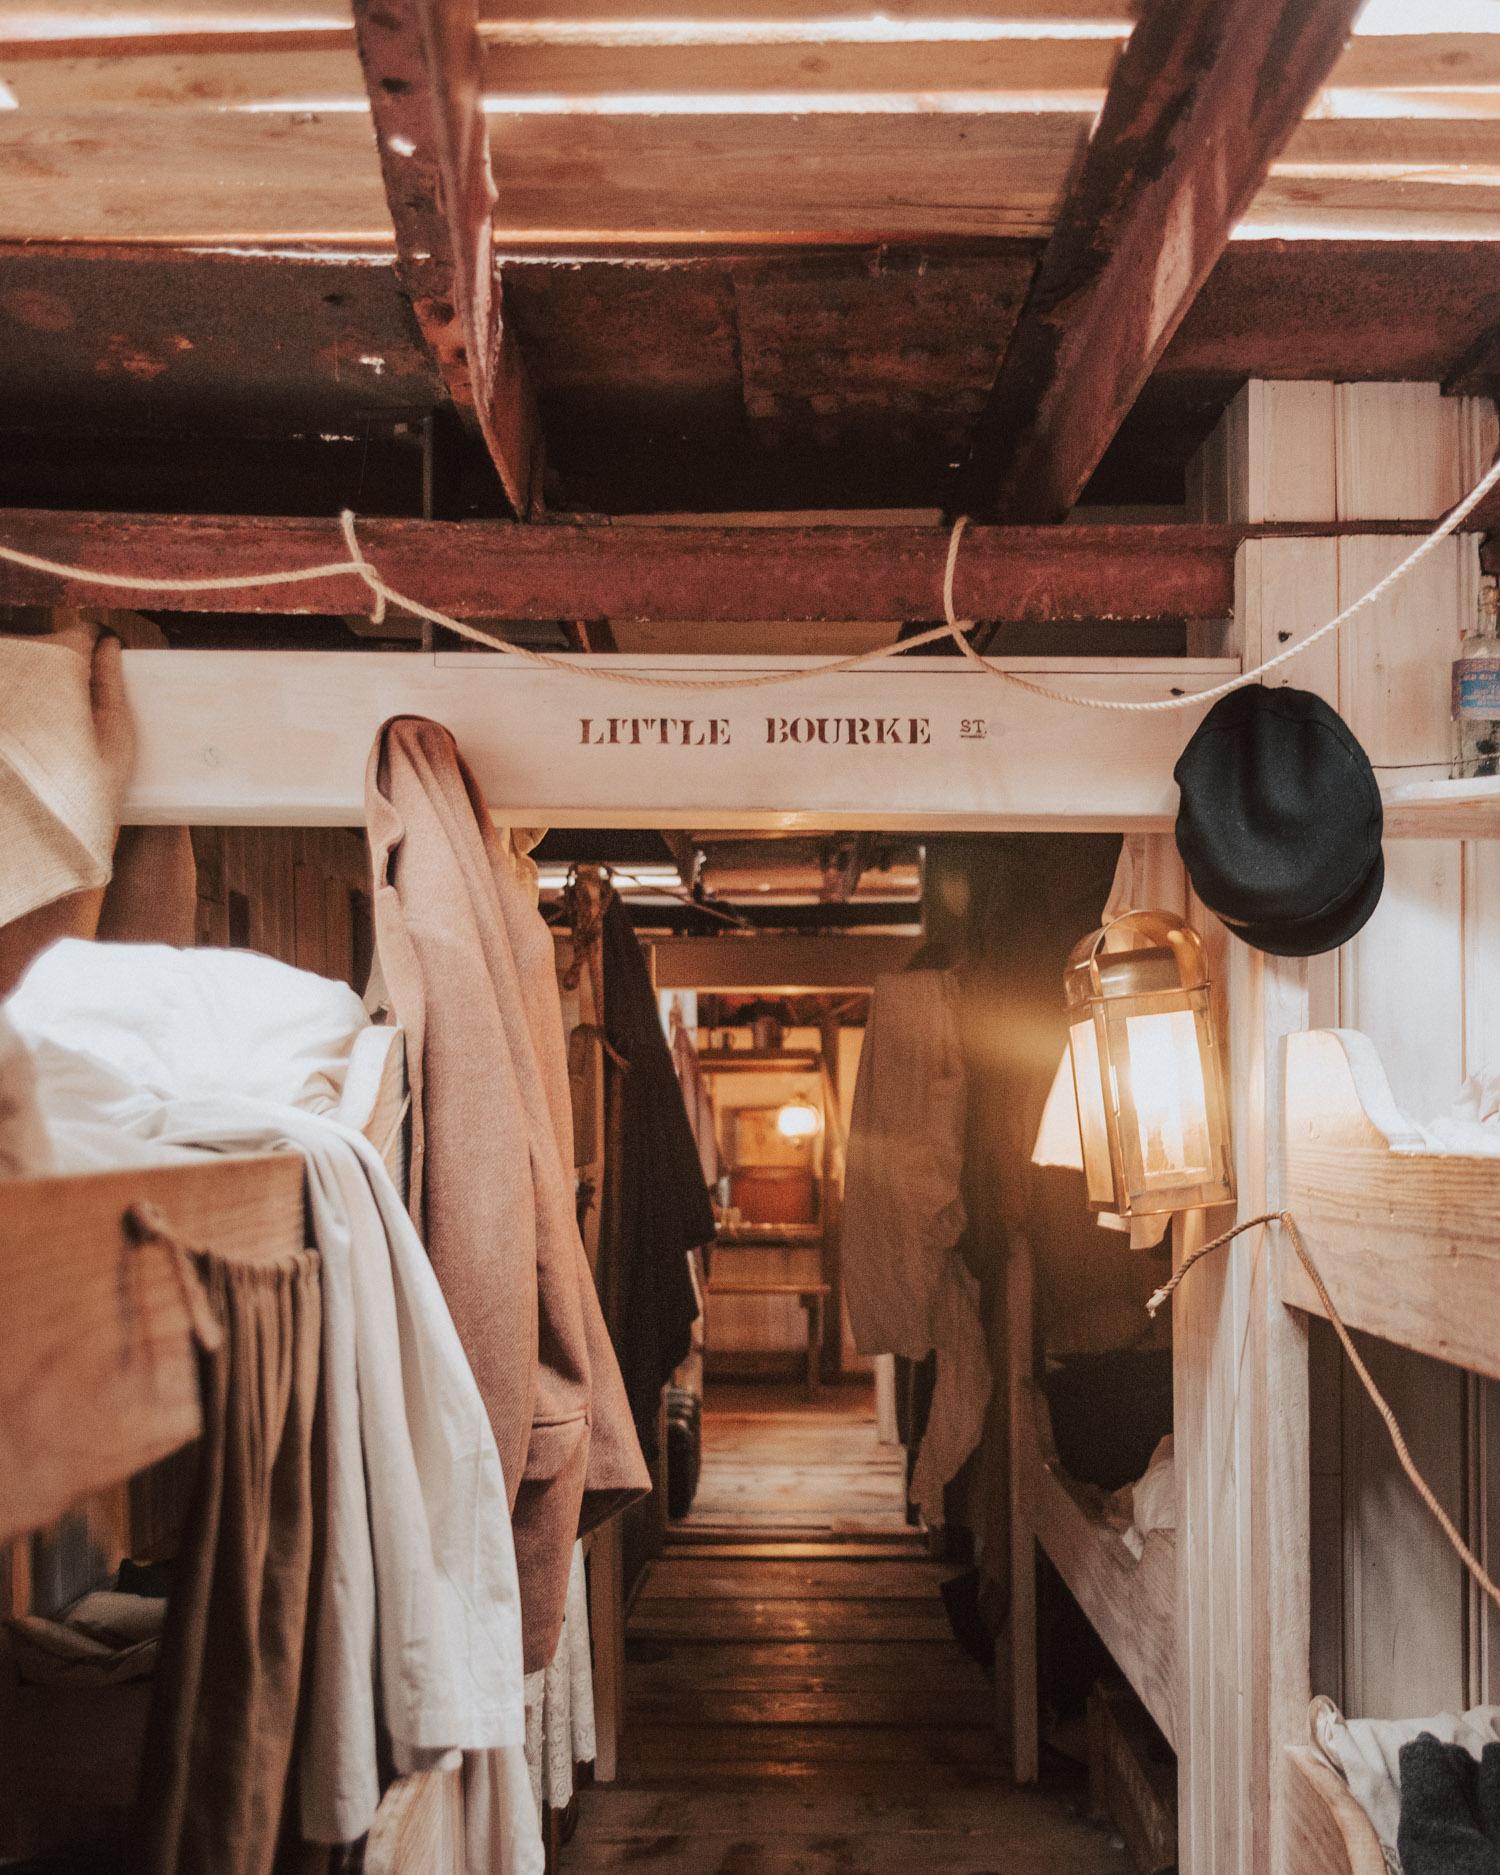 Brunel's SS Great Britain |Attraction in Bristol